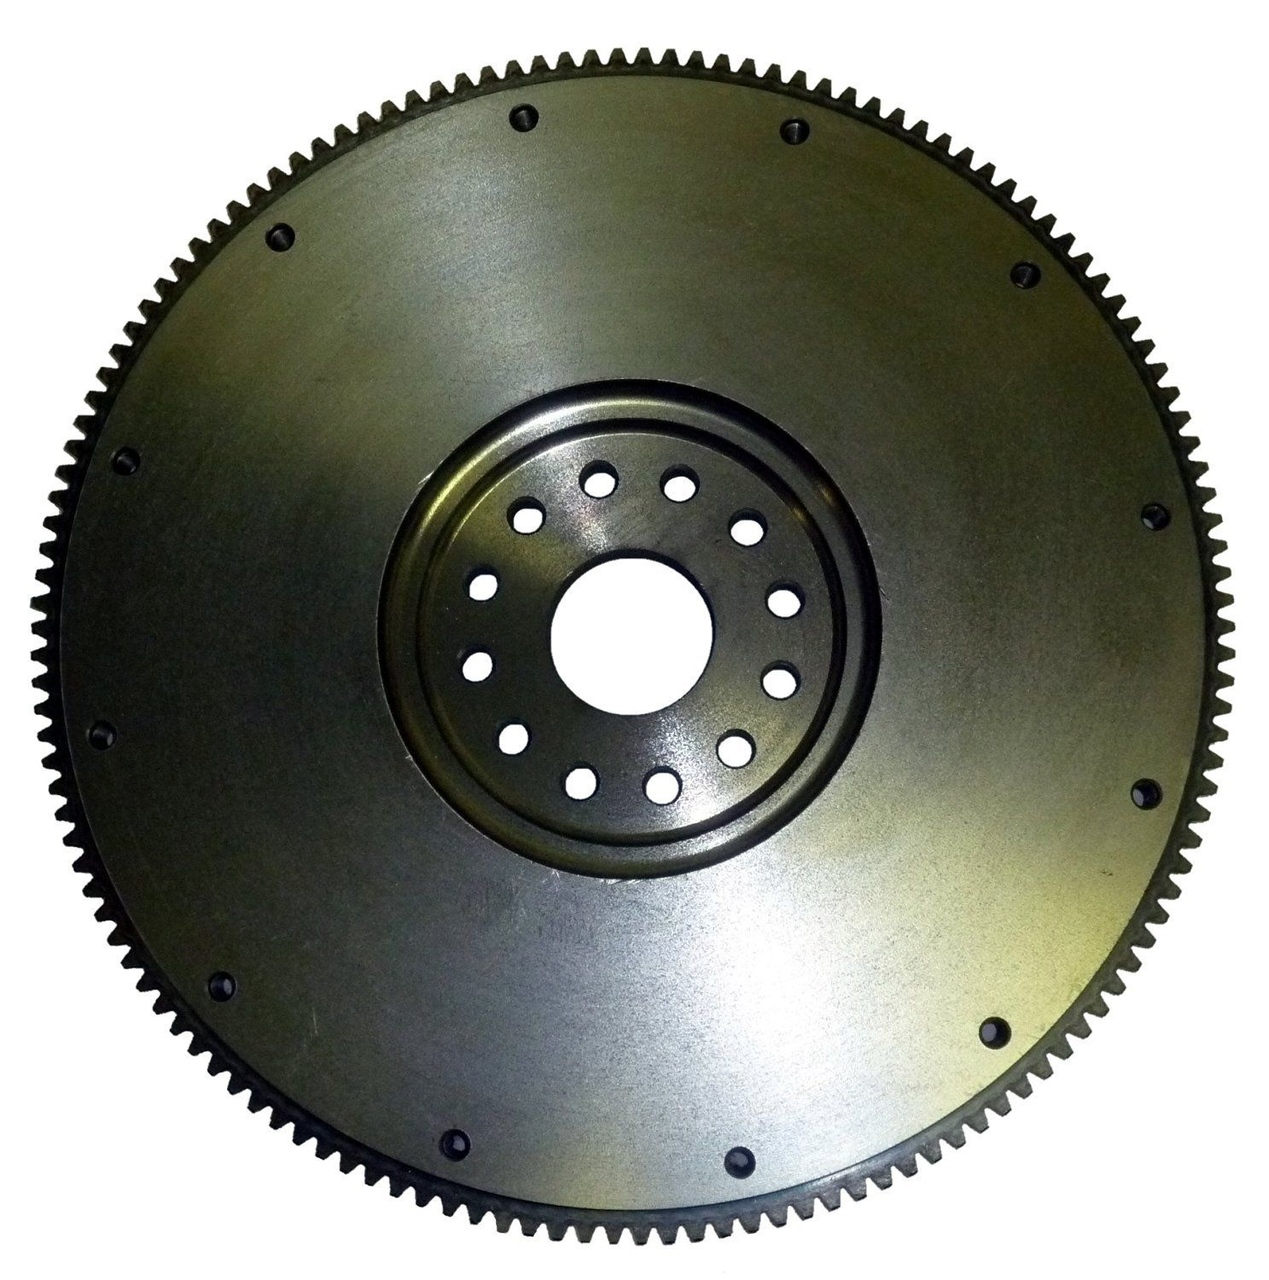 Engine Flywheel # 1821915C91 - NAVISTAR DT 466